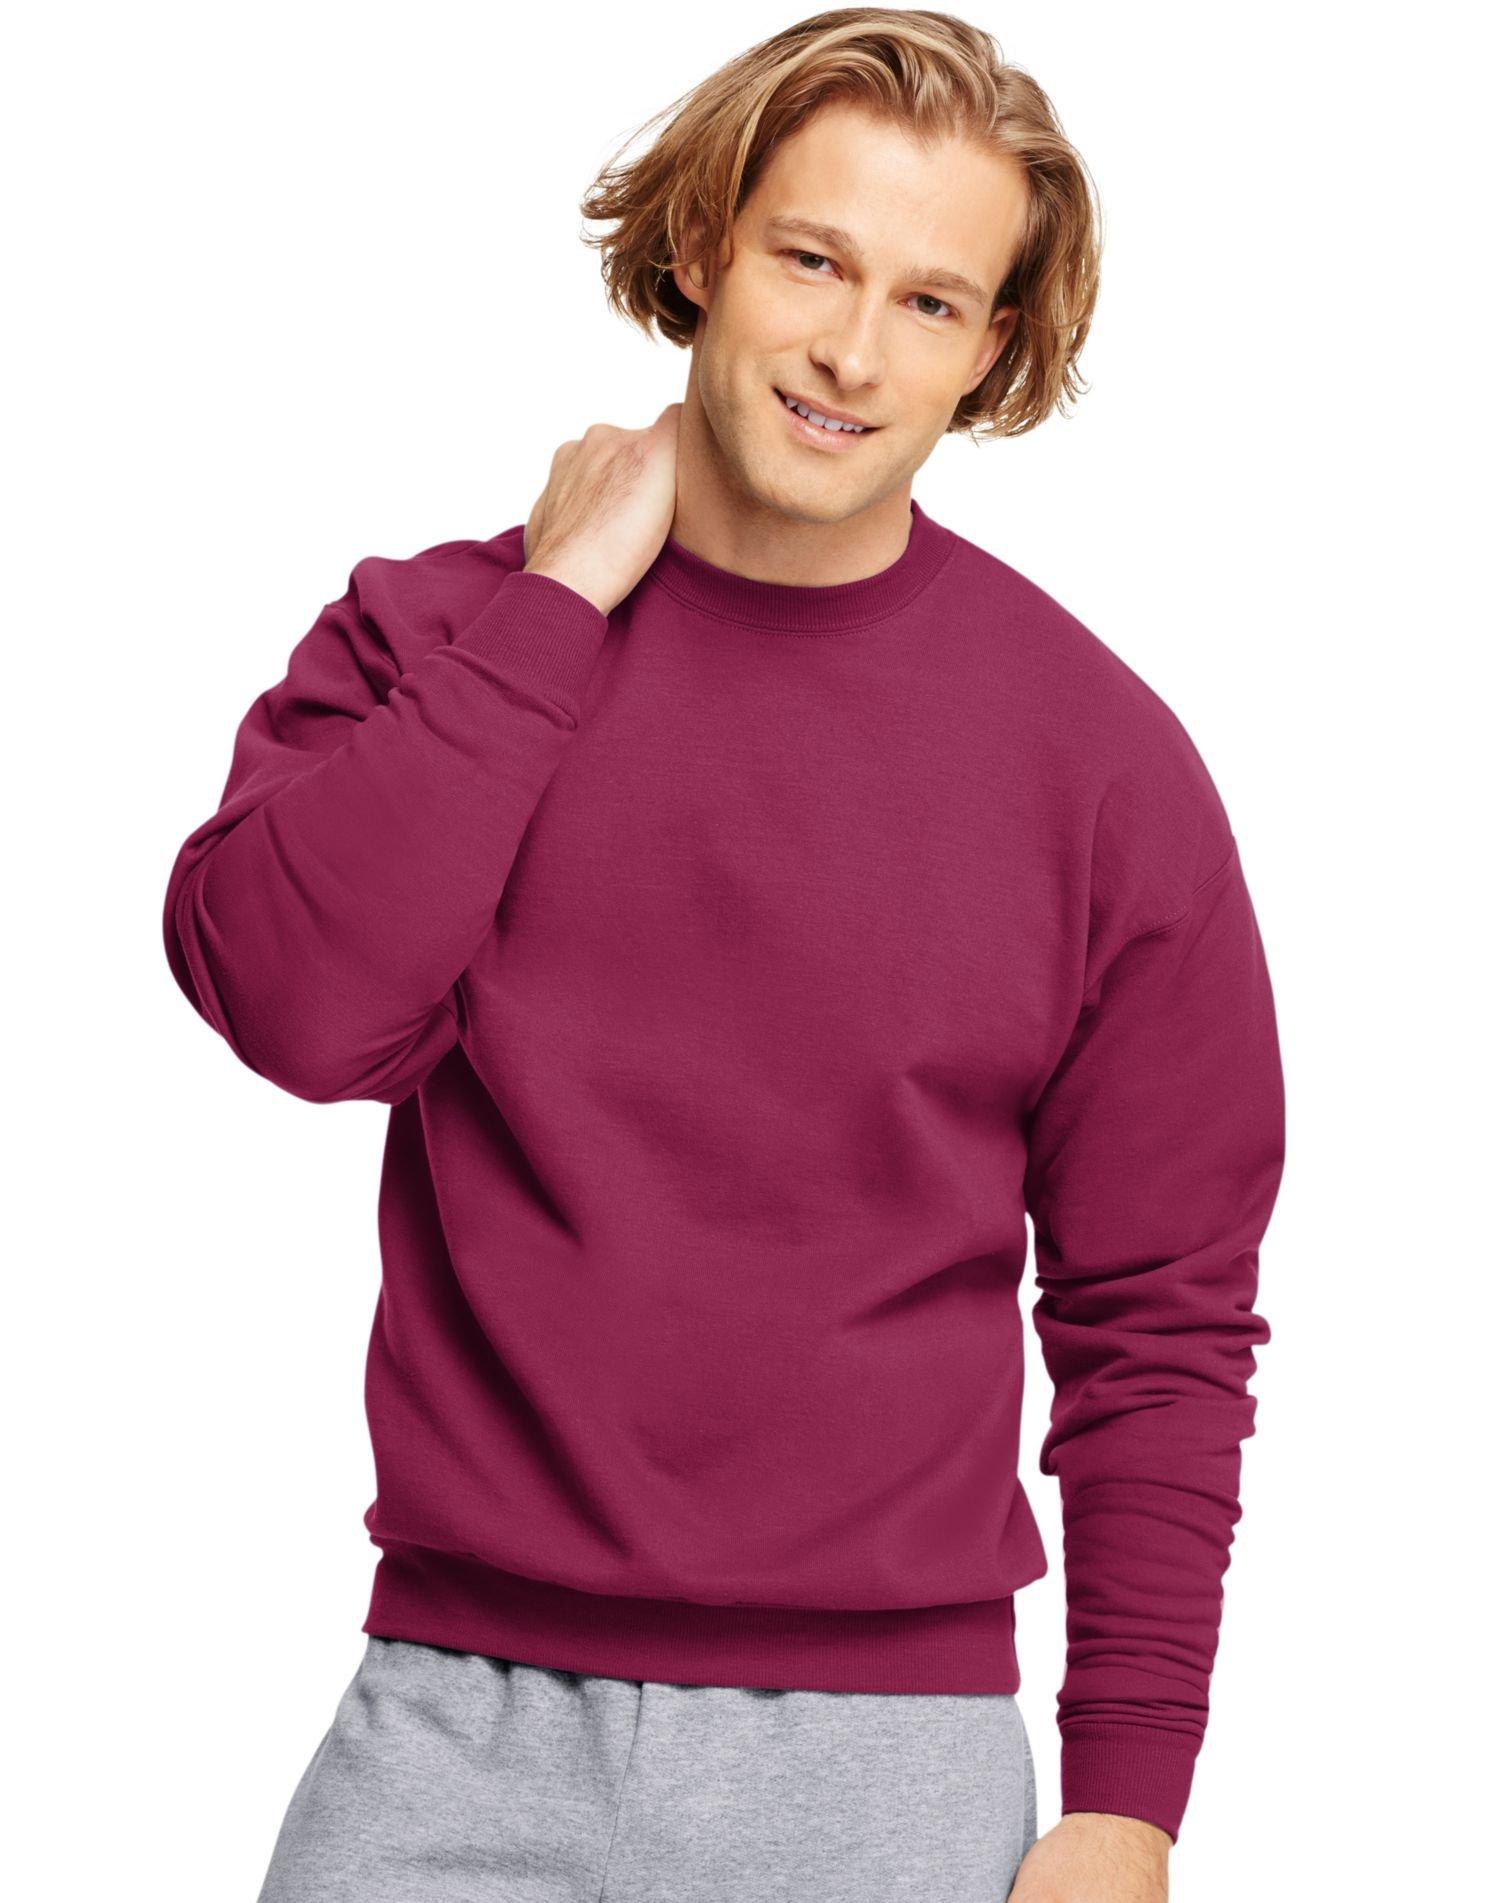 Hanes ComfortBlend EcoSmart Crew Sweatshirt_Cardinal_5XL by Hanes